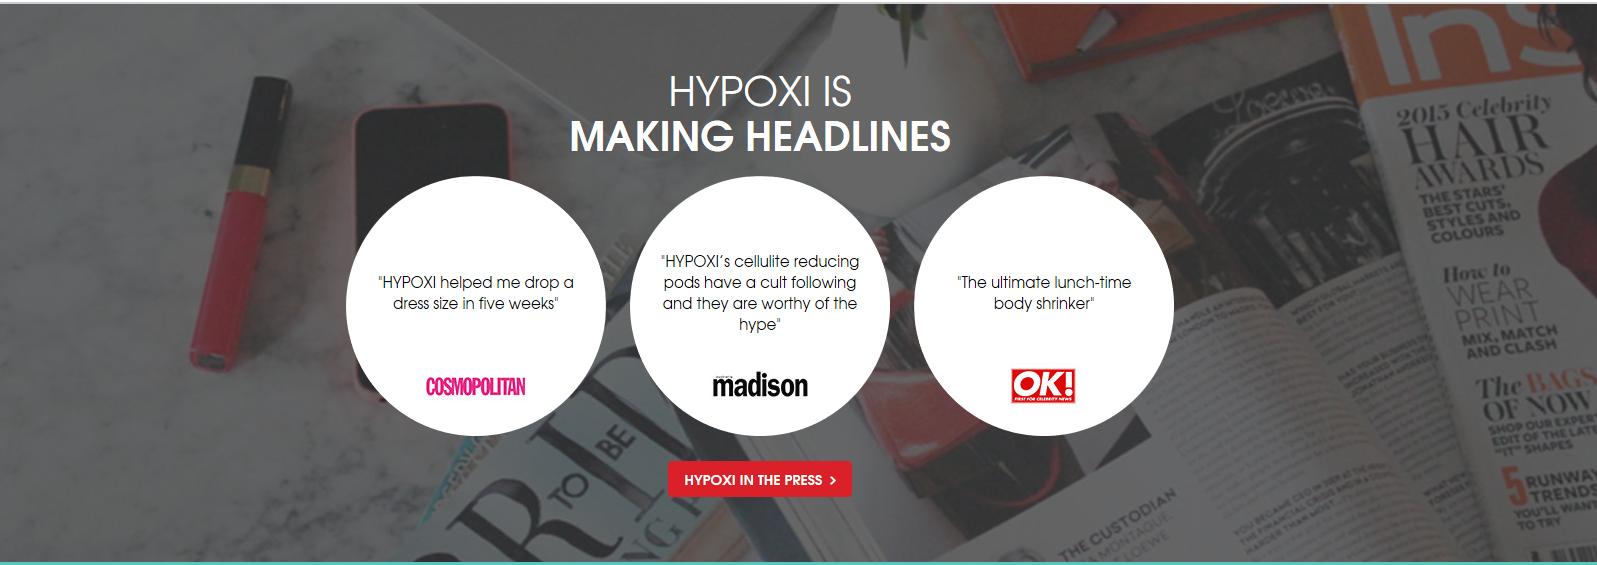 HYPOXI Los Angeles MAKING NEWS.png